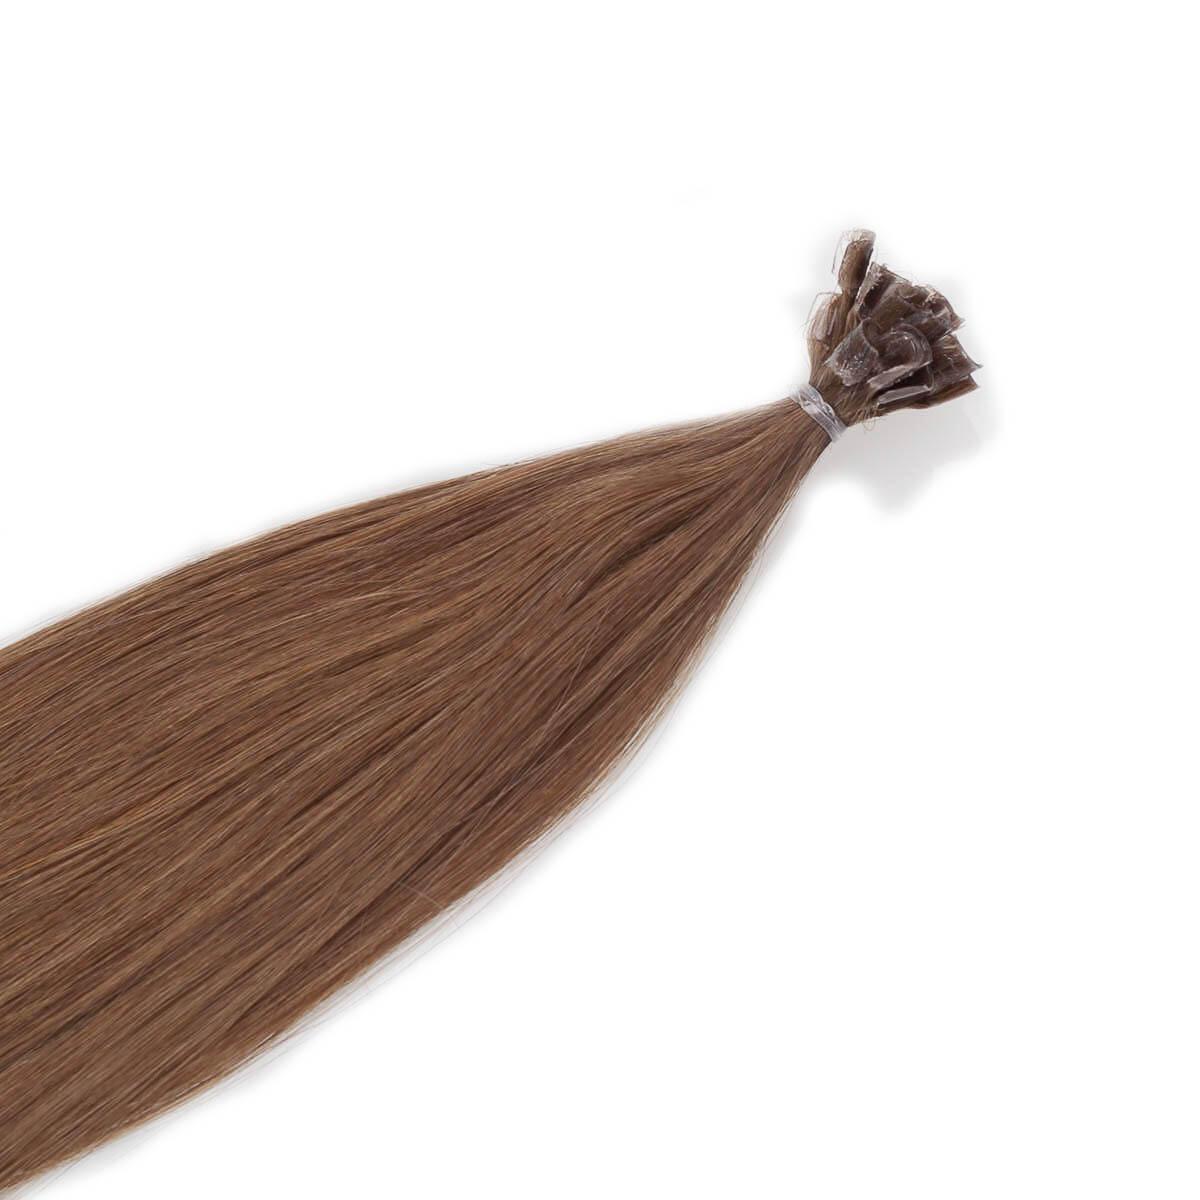 Nail Hair Original 5.1 Medium Ash Brown 60 cm